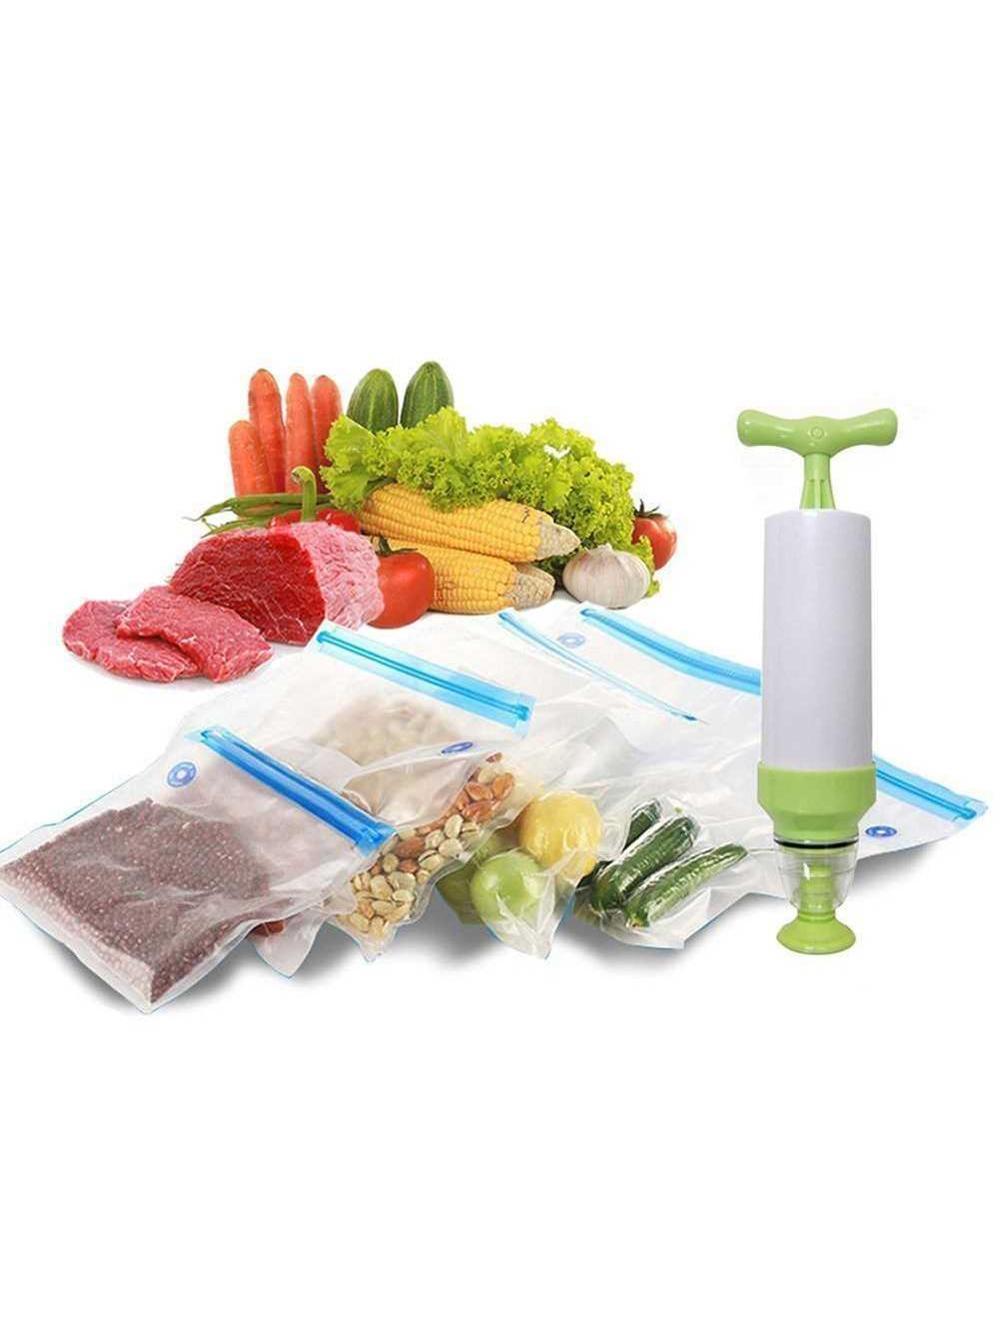 Reusable Food Vacuum Sealed Bag Handheld Sealing Packaging Machine Kitchen Ziplock Packaging Eco Friendly Storage,Without pump